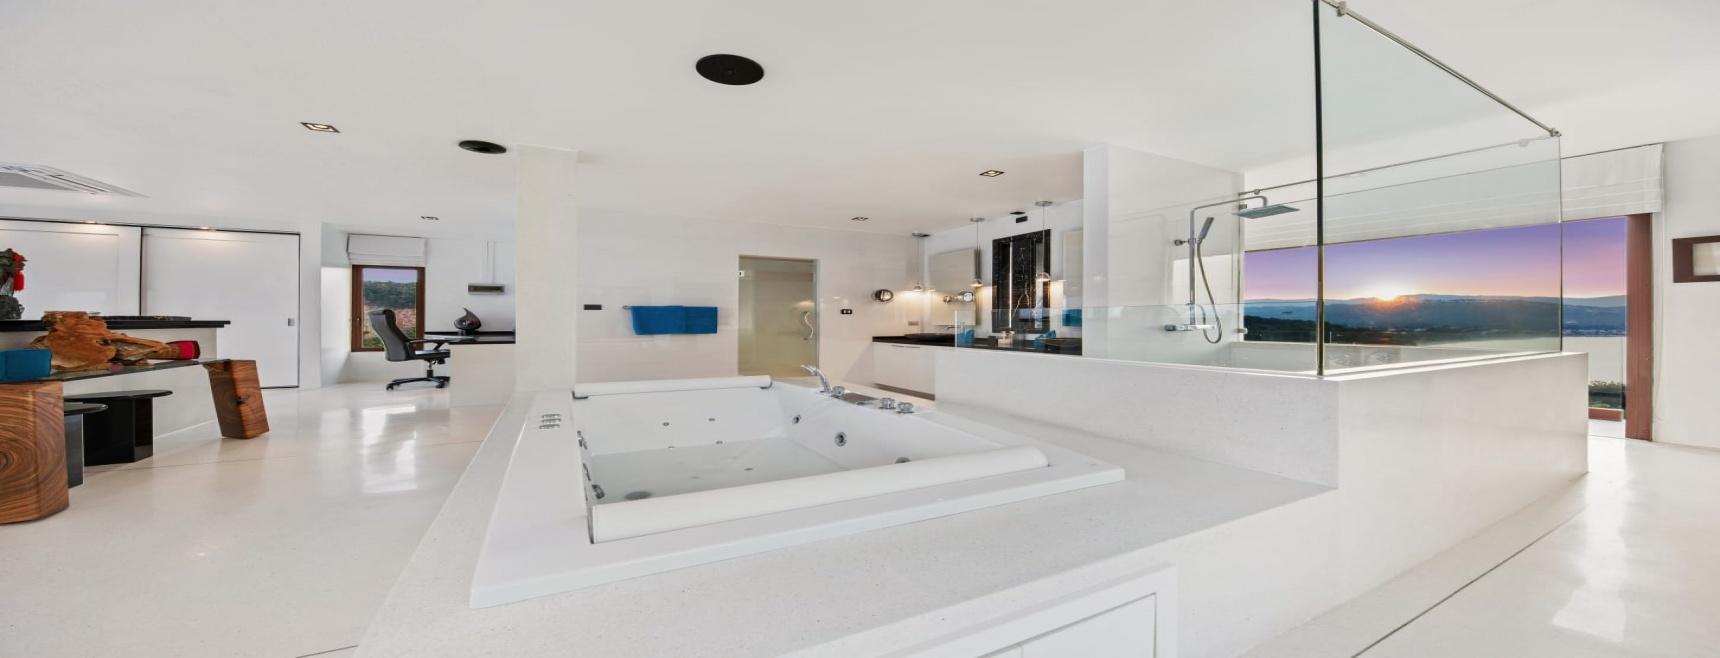 3 Bed Sea View Villa For Sale Bangrak Bay, Koh Samui (Thai-Real.com)